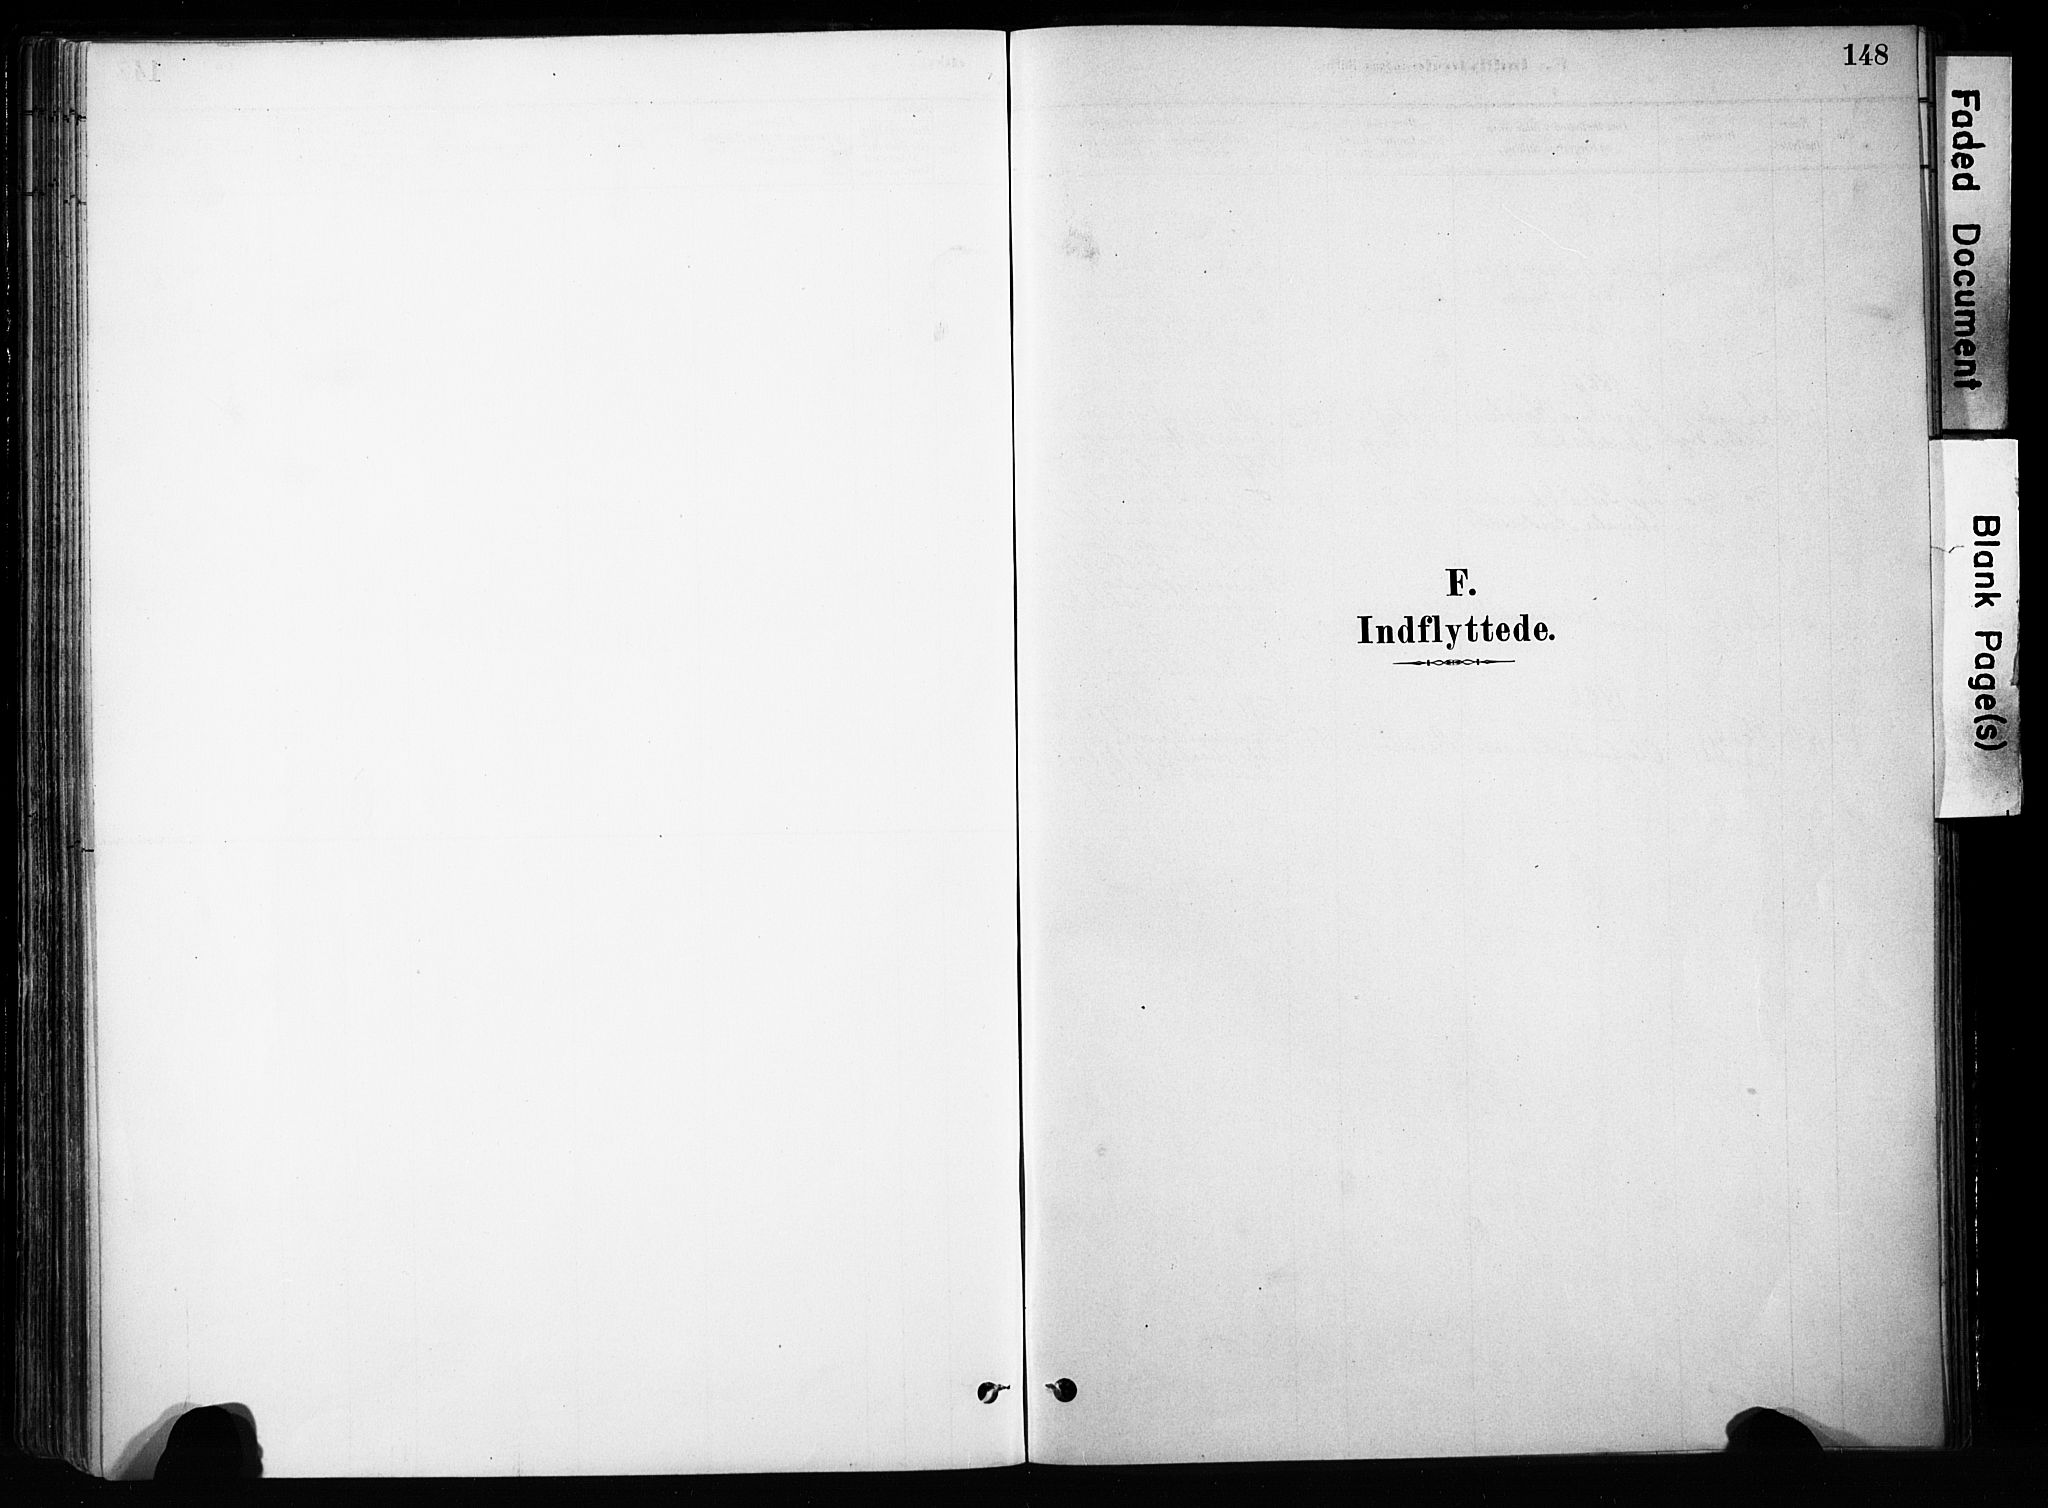 SAH, Skjåk prestekontor, Ministerialbok nr. 4, 1880-1904, s. 148